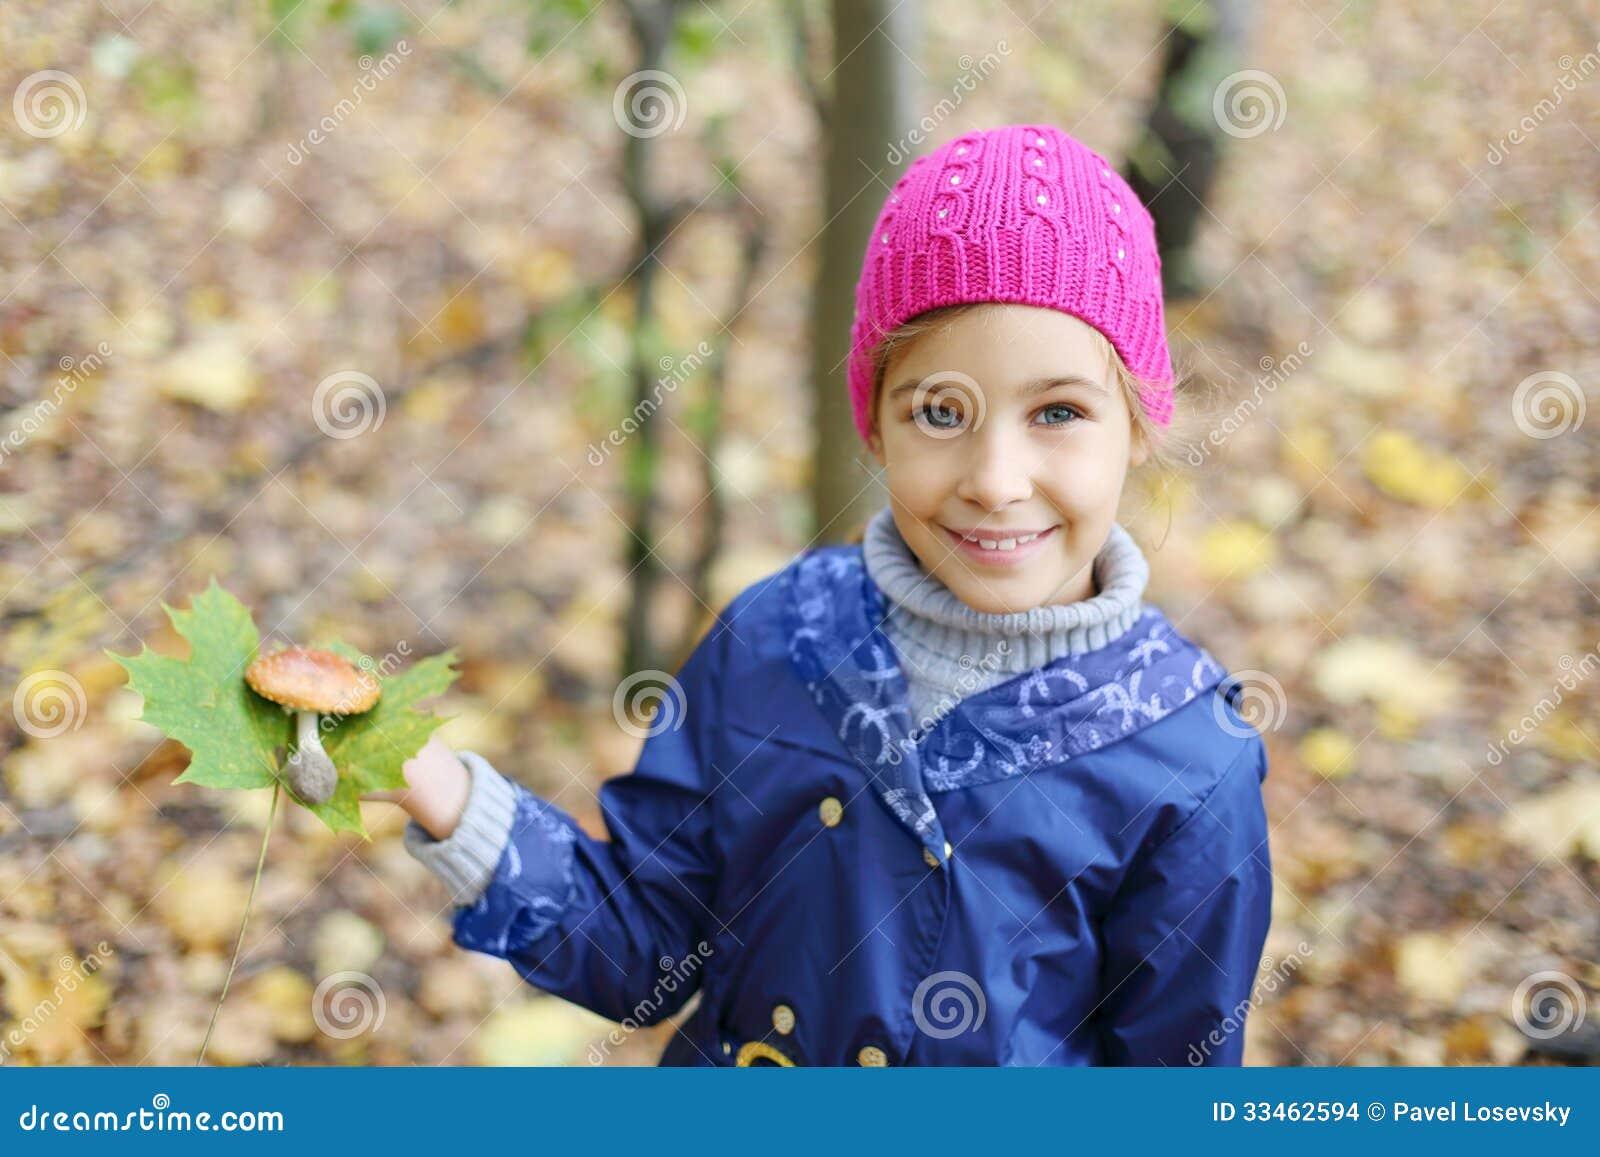 La muchacha feliz sostiene la hoja verde